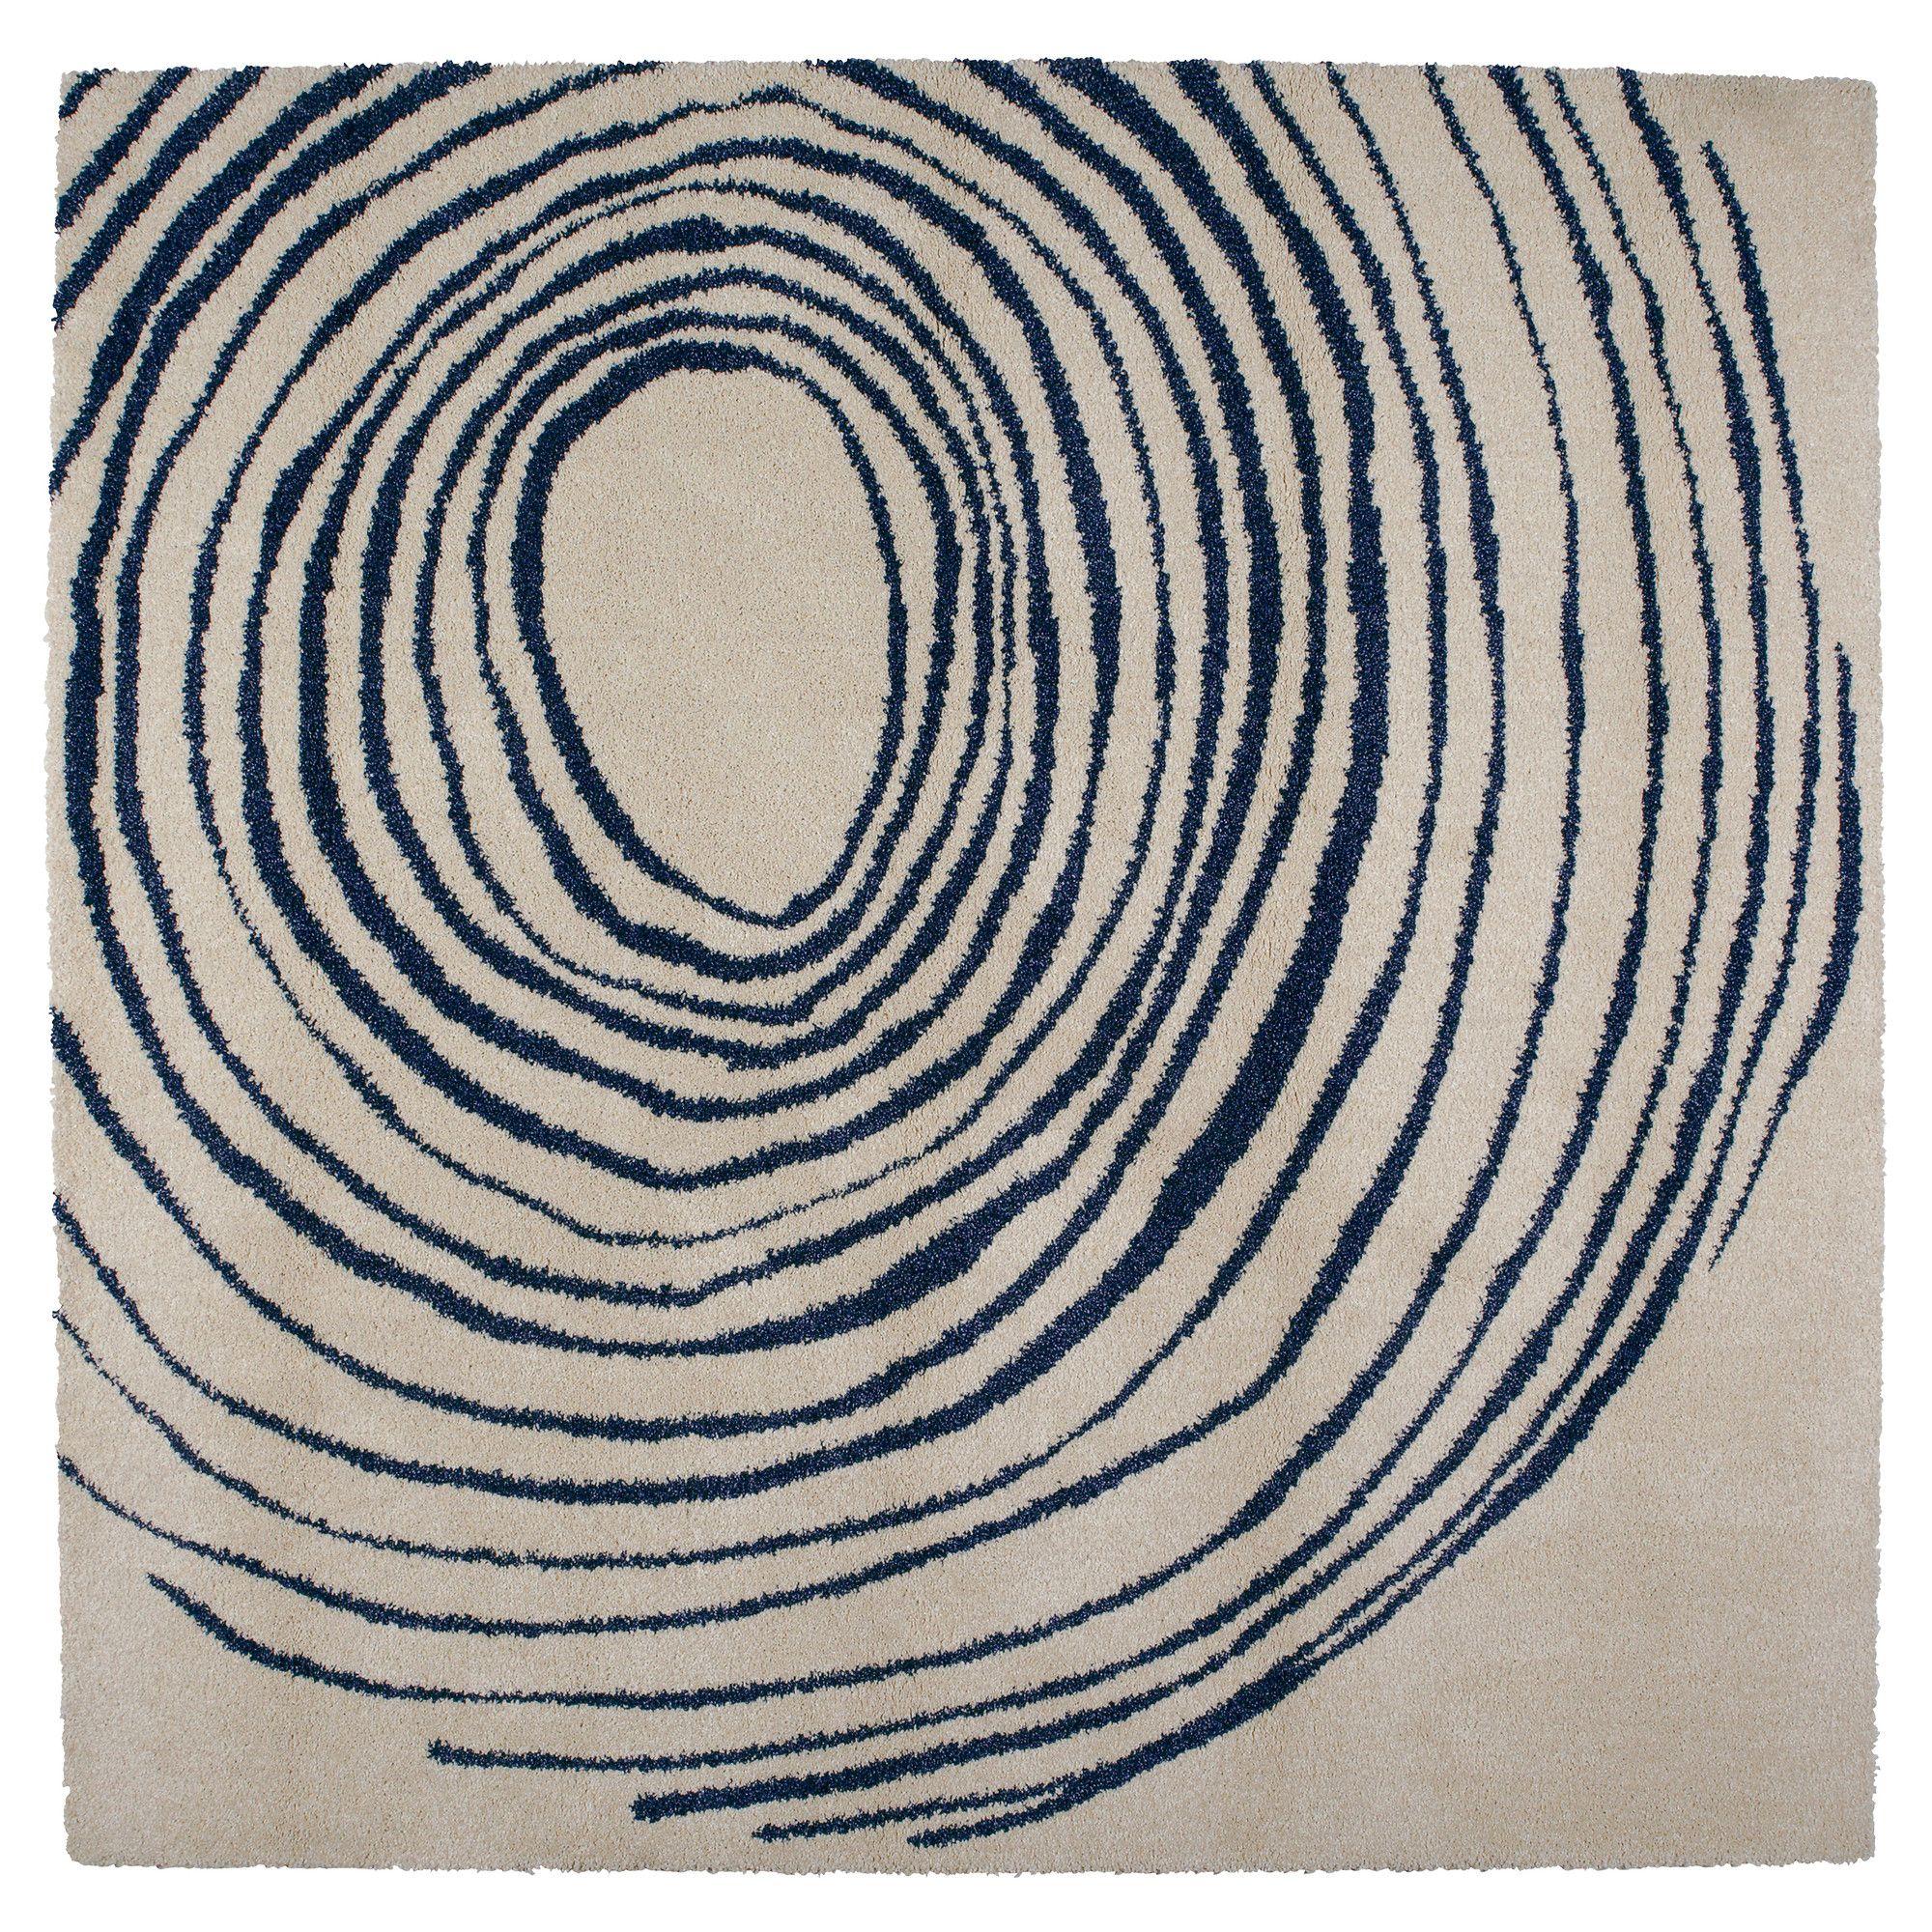 Eivor Cirkel Rug High Pile Ikea Ikea Rug Medium Rugs Circle Rug